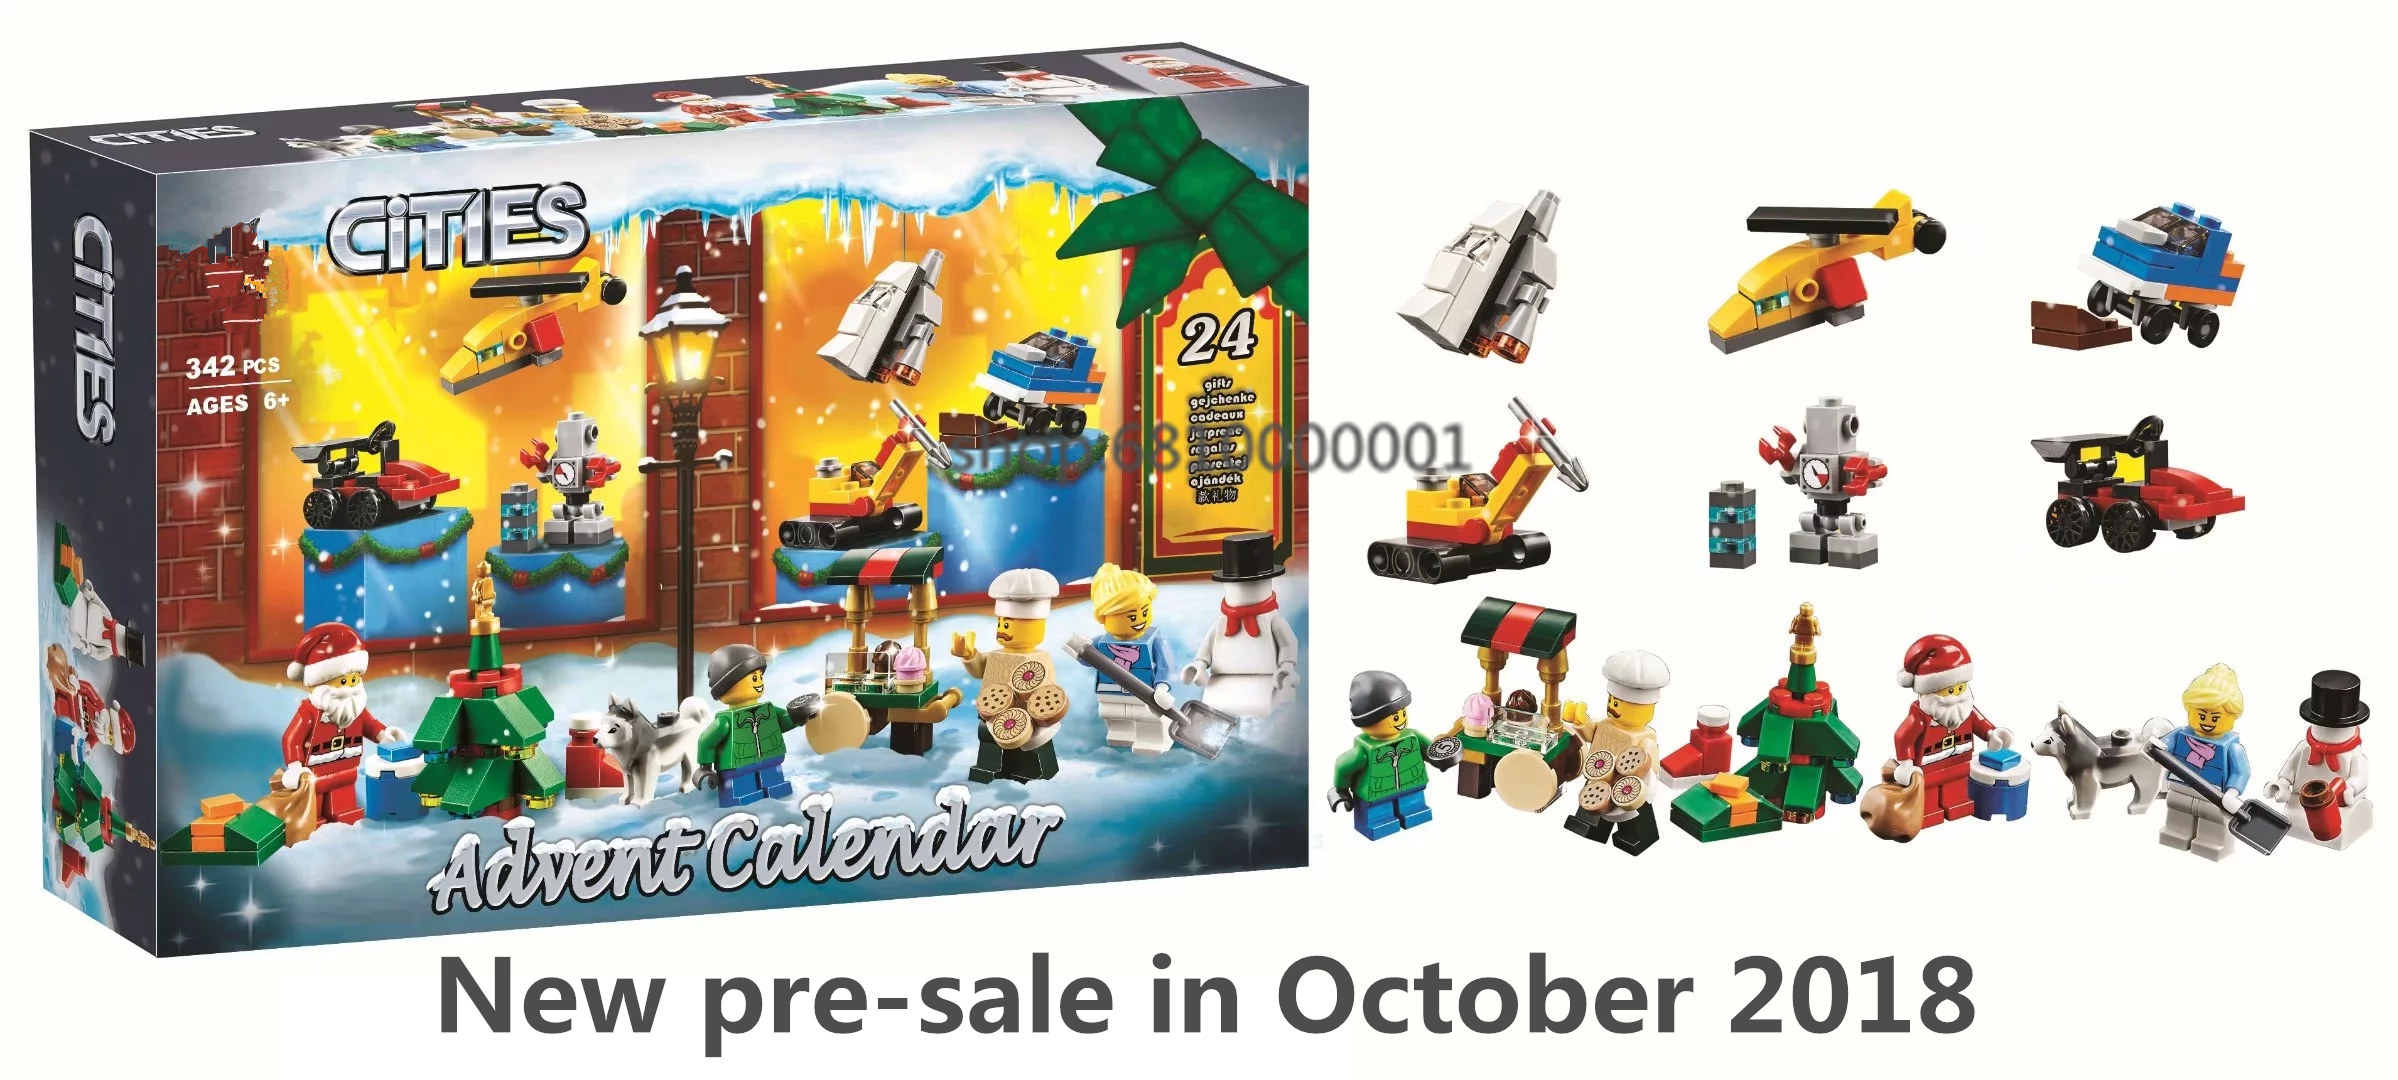 City Advent Calendar Santa\'s veterinary Shop Building Blocks Brick Compatible Legoingly kits Model Toy for child Christmas gift chuck whelon where s santa